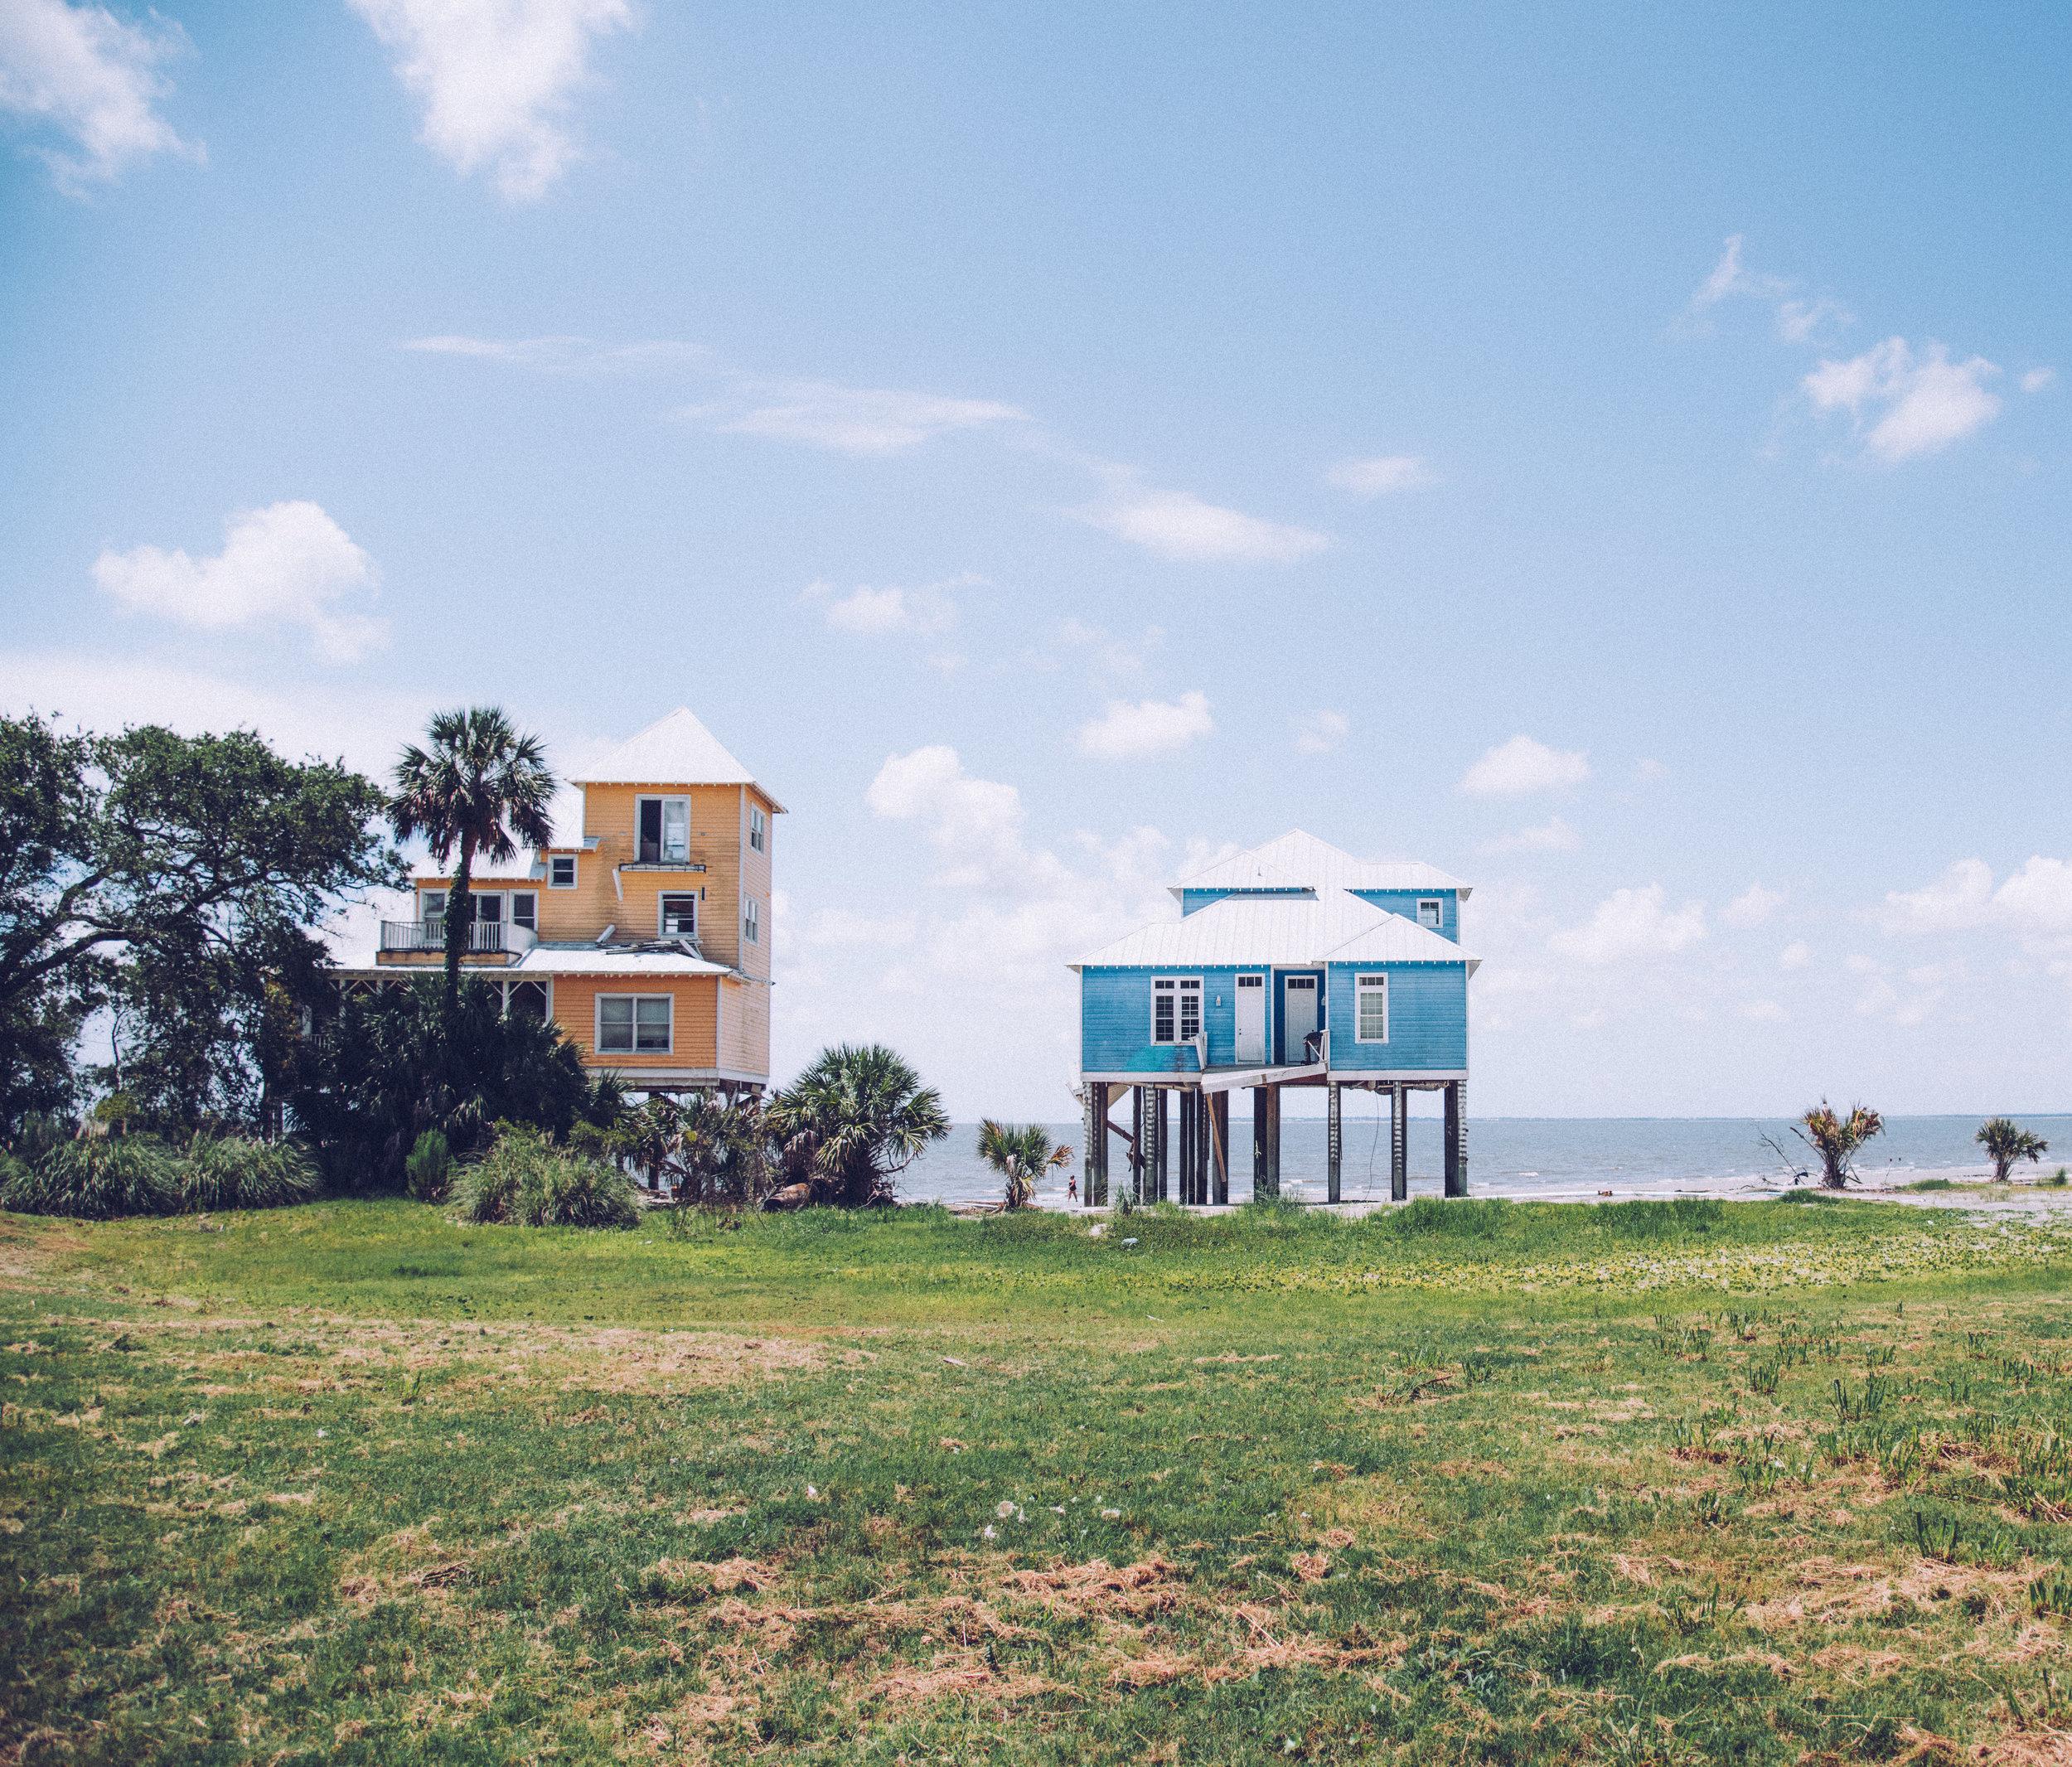 kw-abandoned-beachfront-homes-sc-img2.jpg